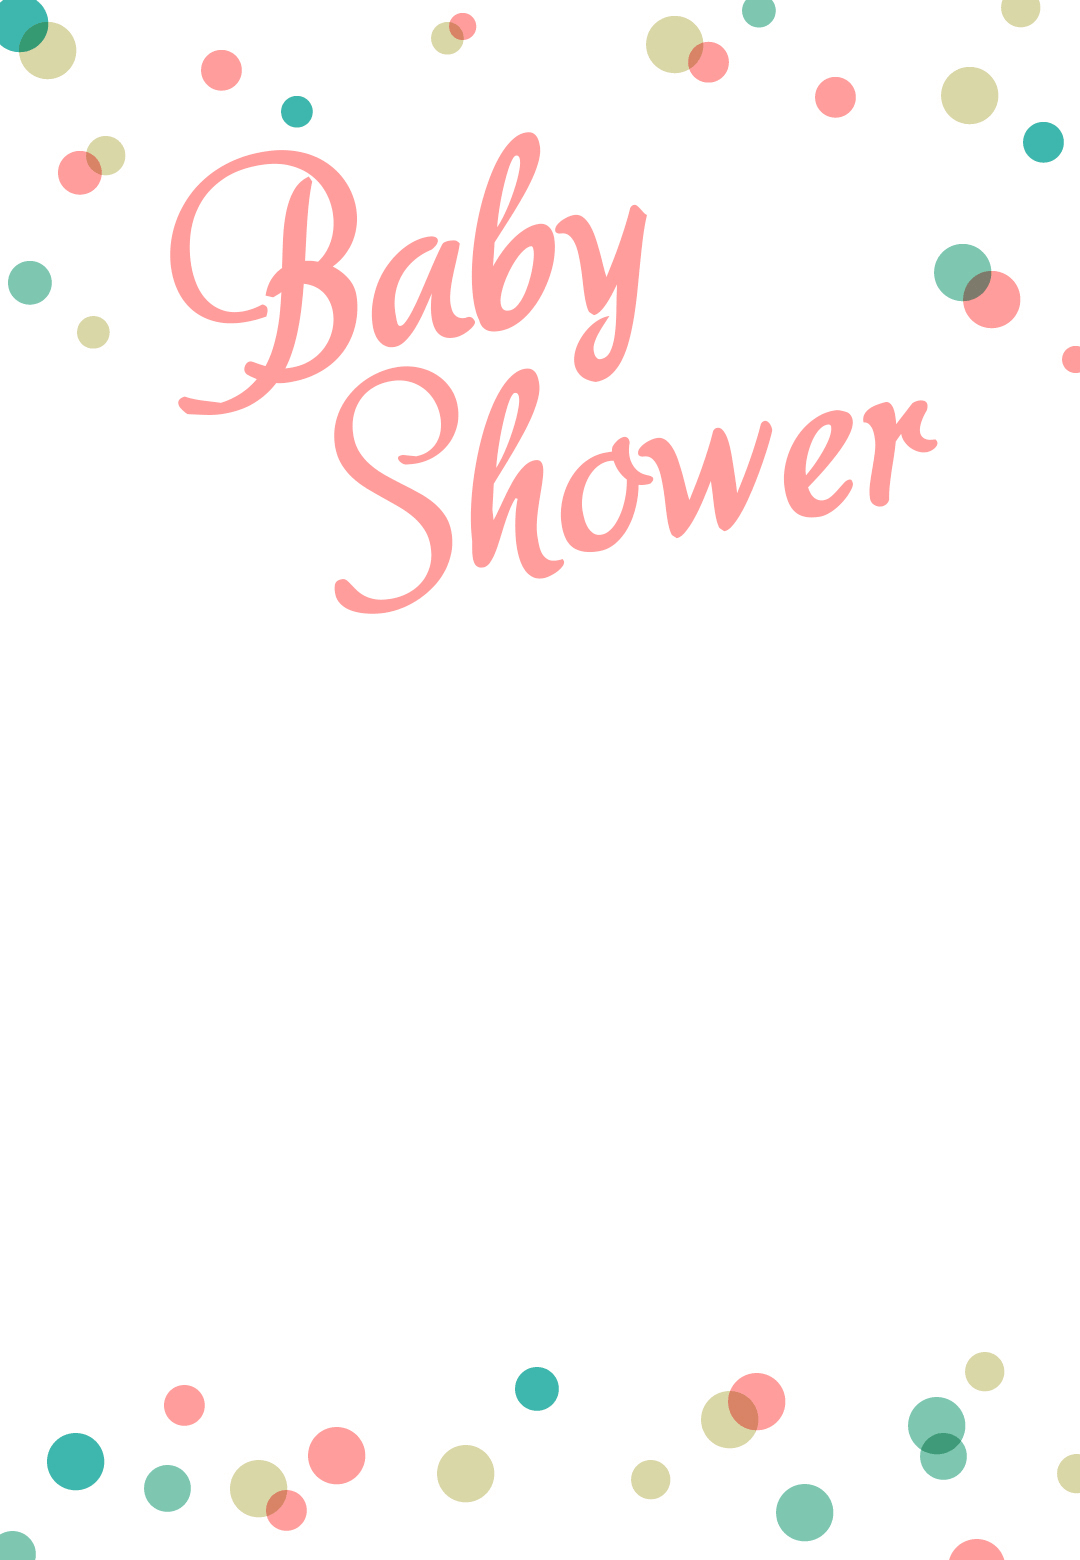 Dancing Dots Borders - Free Printable Baby Shower Invitation - Free Printable Baby Shower Clip Art